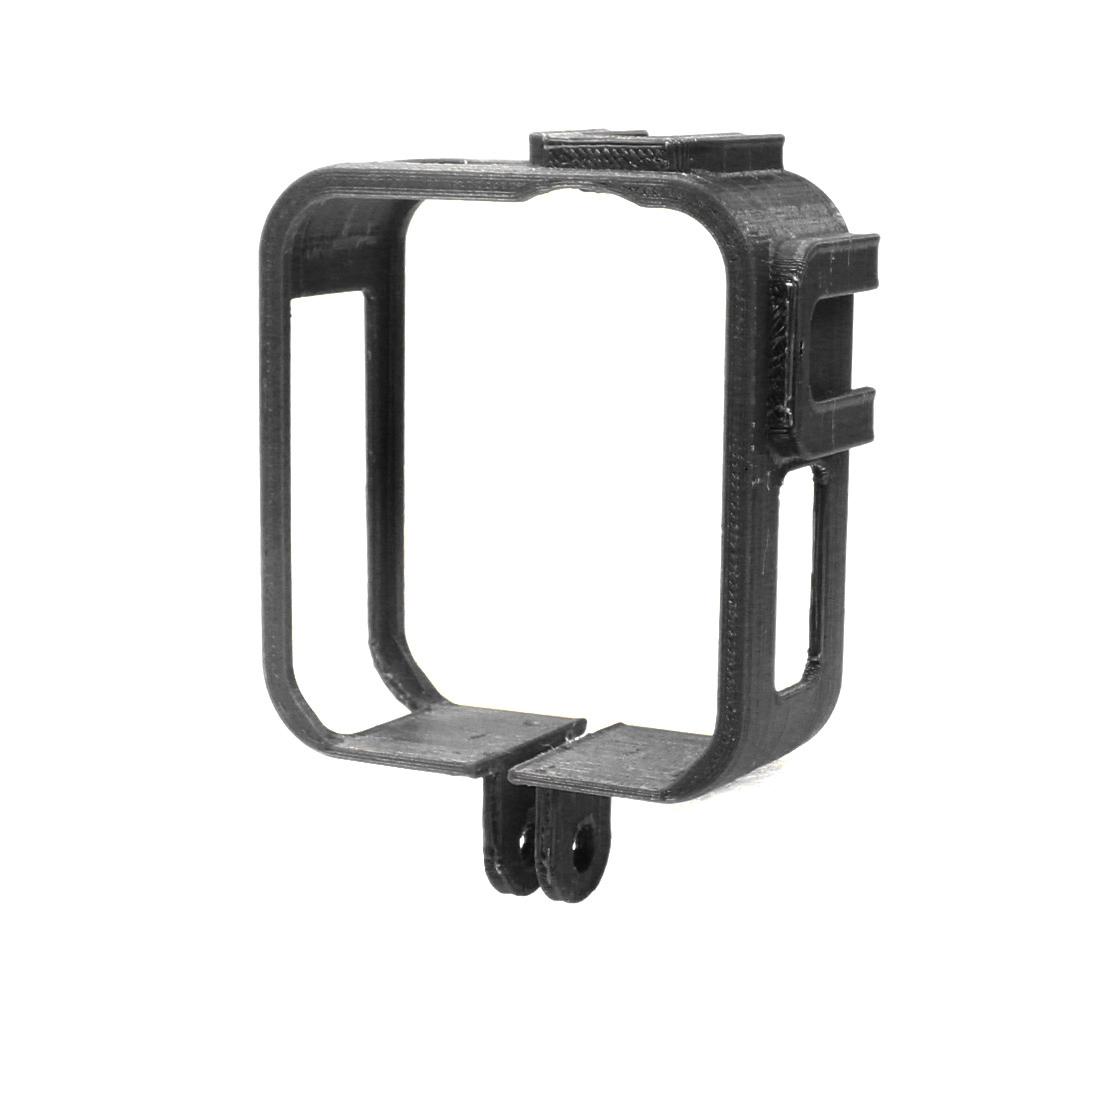 XT-Xinte cámara caso 3D impresión Pla Estuche Metal Varilla De Extensión Para Gopro MAX